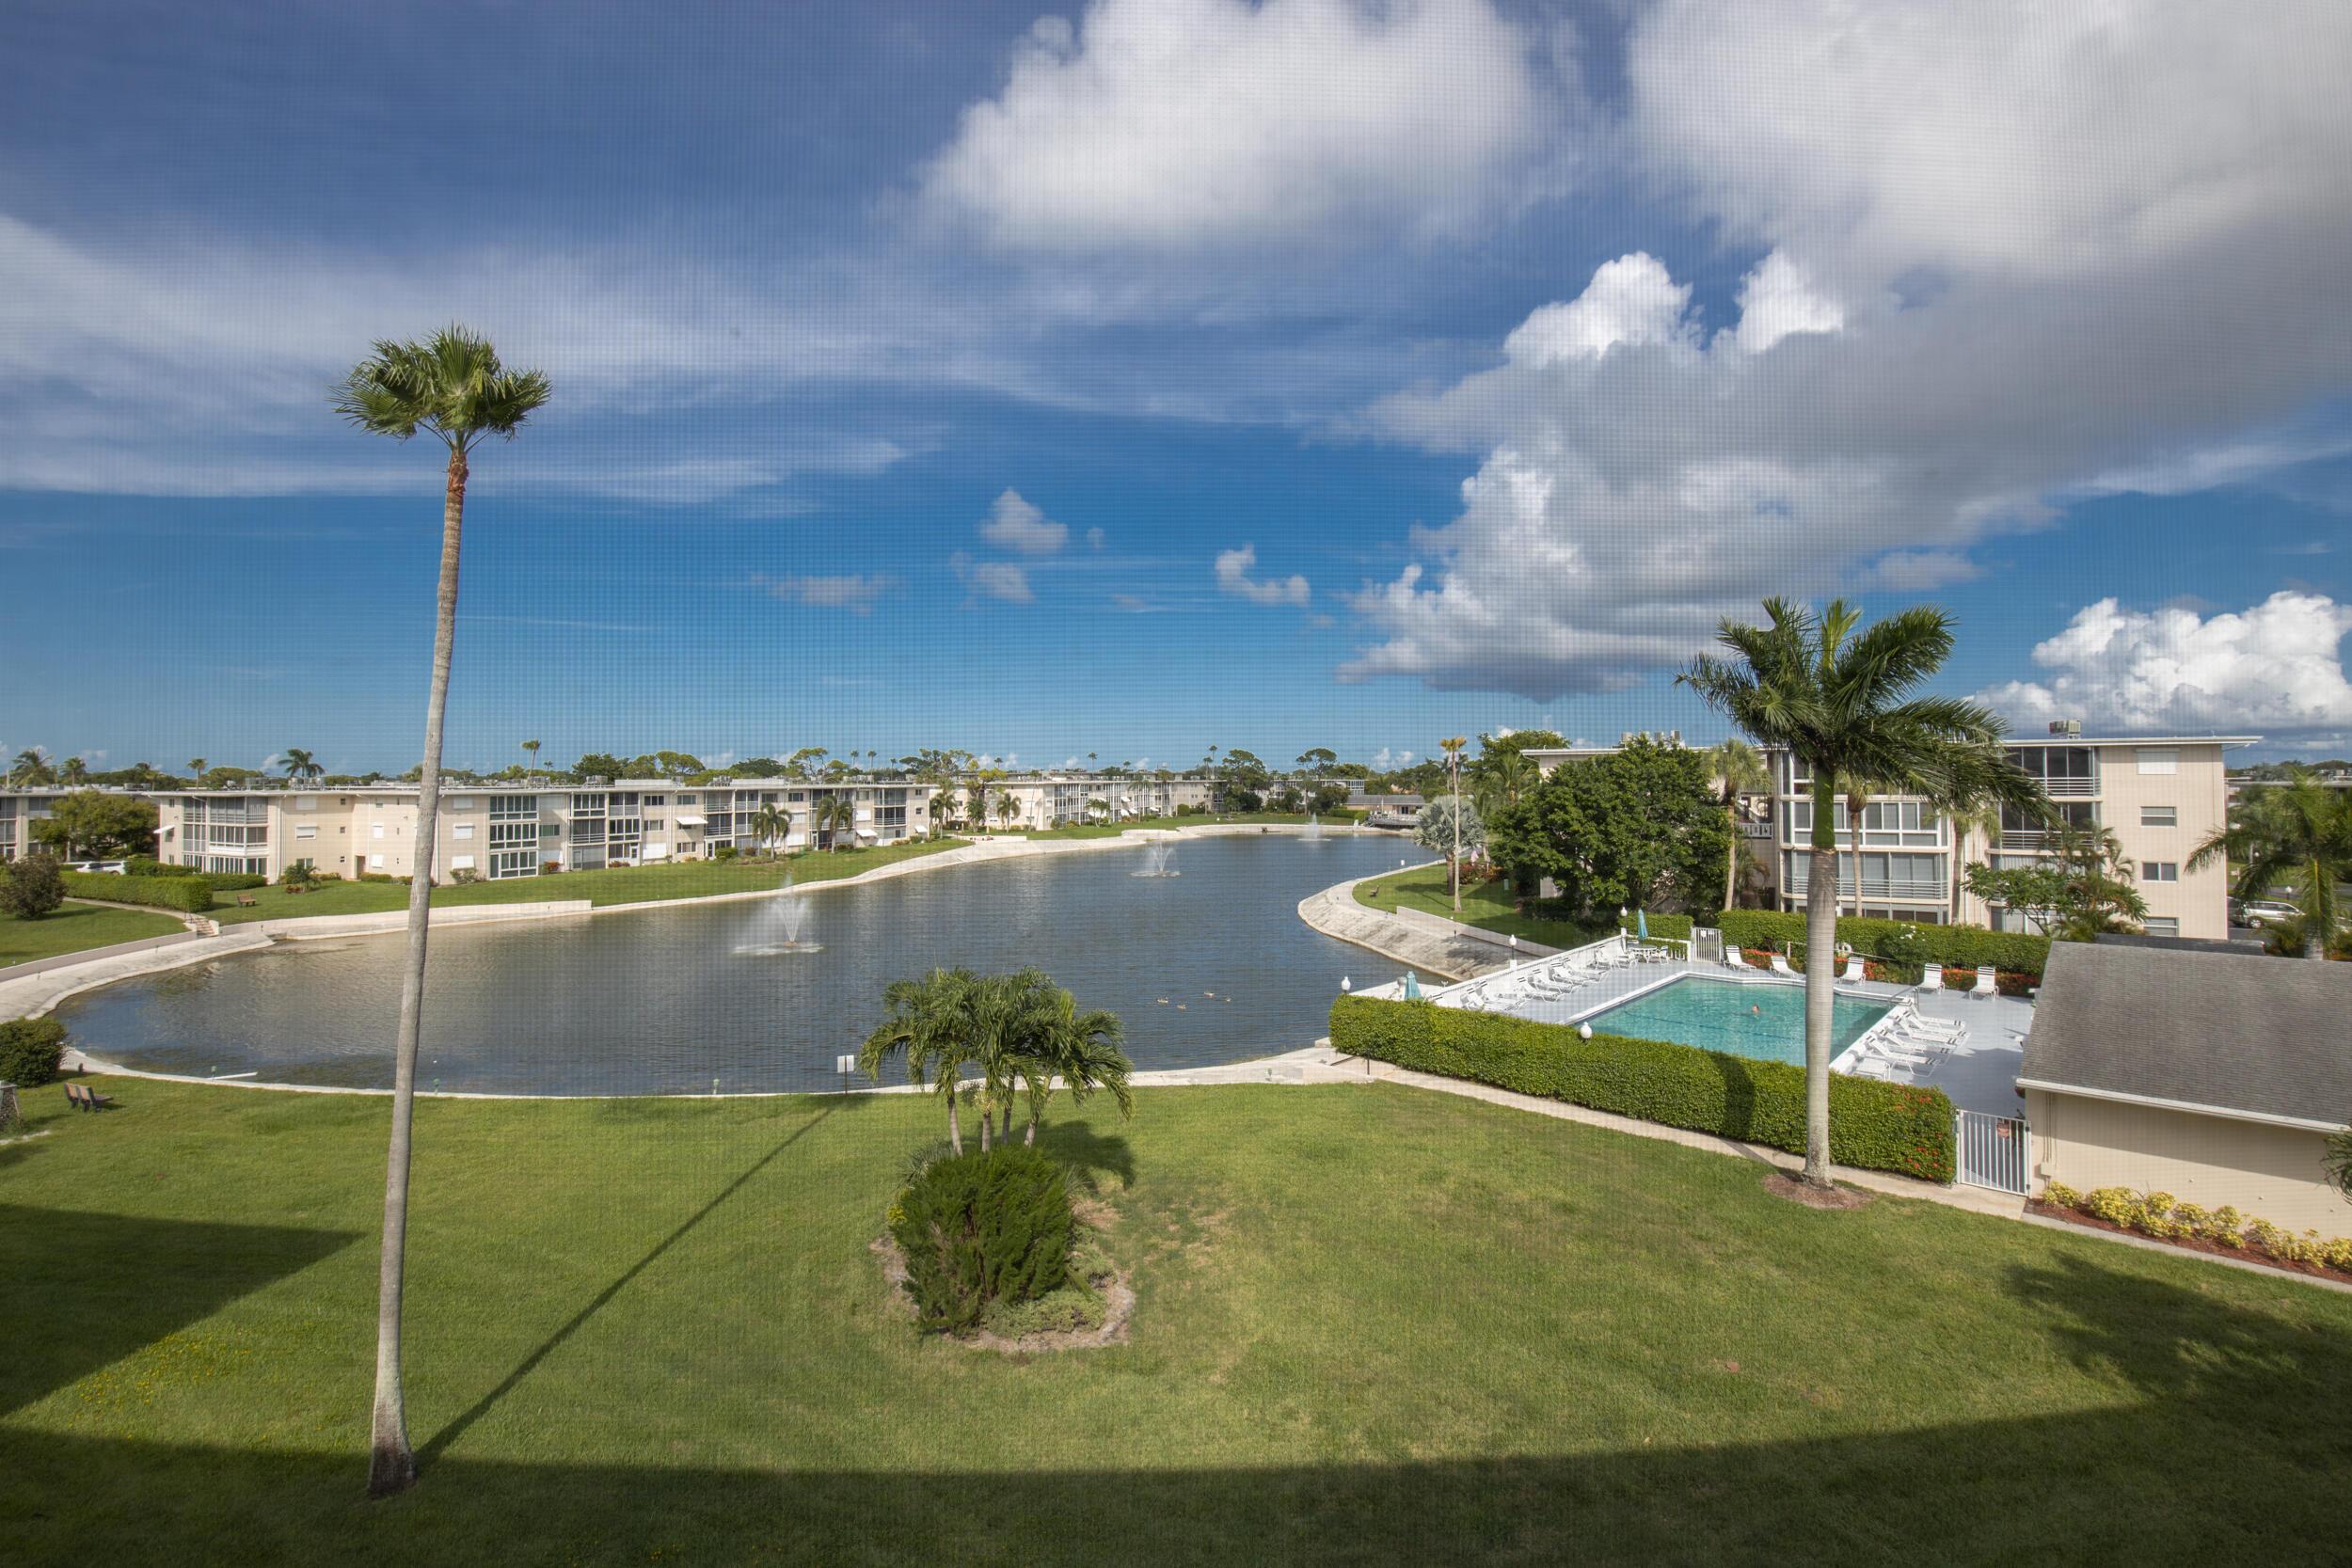 2728 Garden Unit 414, Lake Worth, Florida 33461